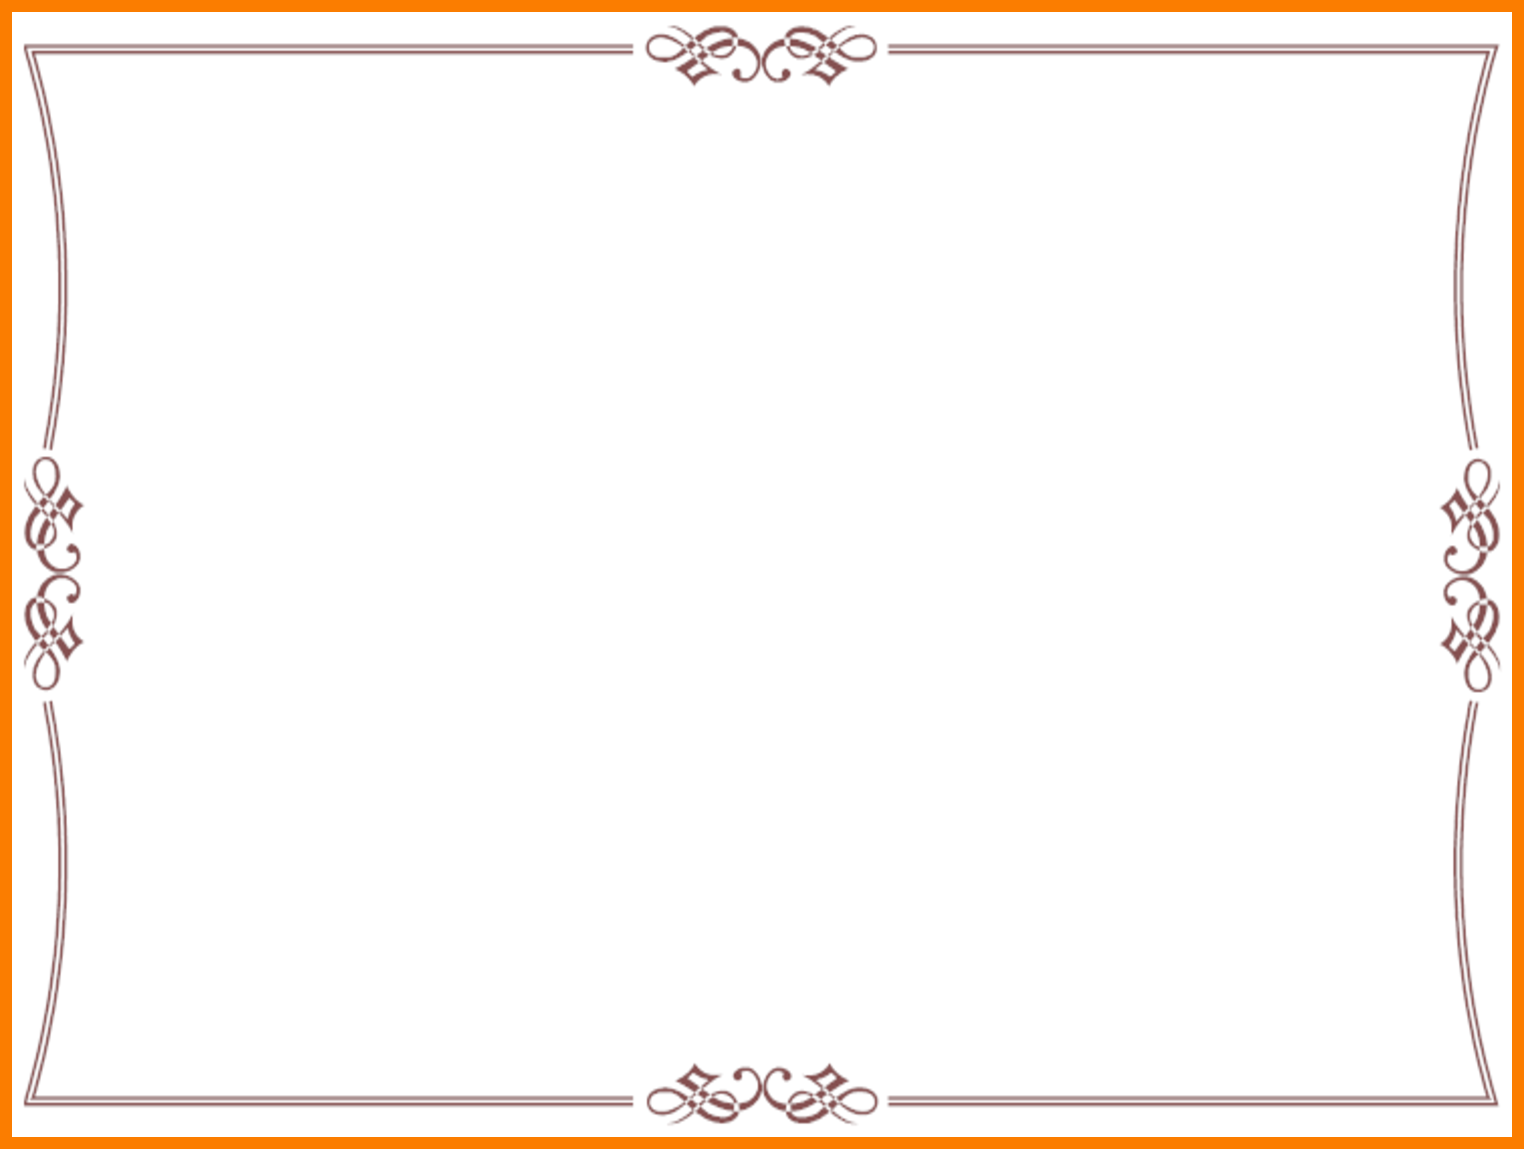 certificate border design Expin.franklinfire.co